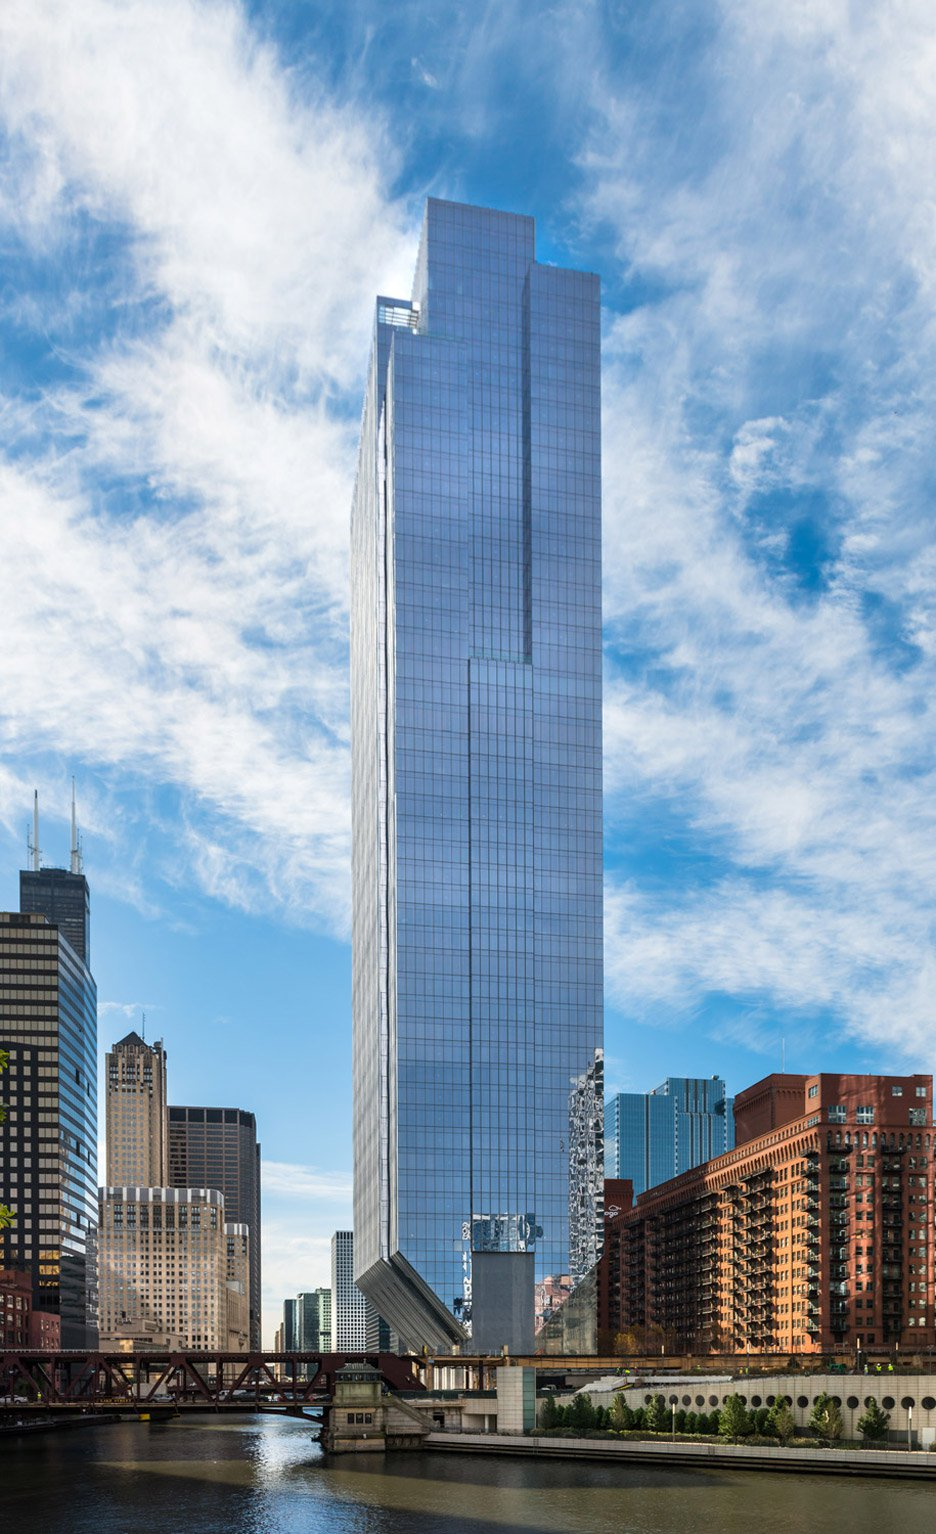 150-north-riverside-office-tower-chiacgo-developer-riverside-investment-development-west-loop-waterfront-river-goettsch-partners-architecture-skyscraper-usa-american_dezeen_10.jpg